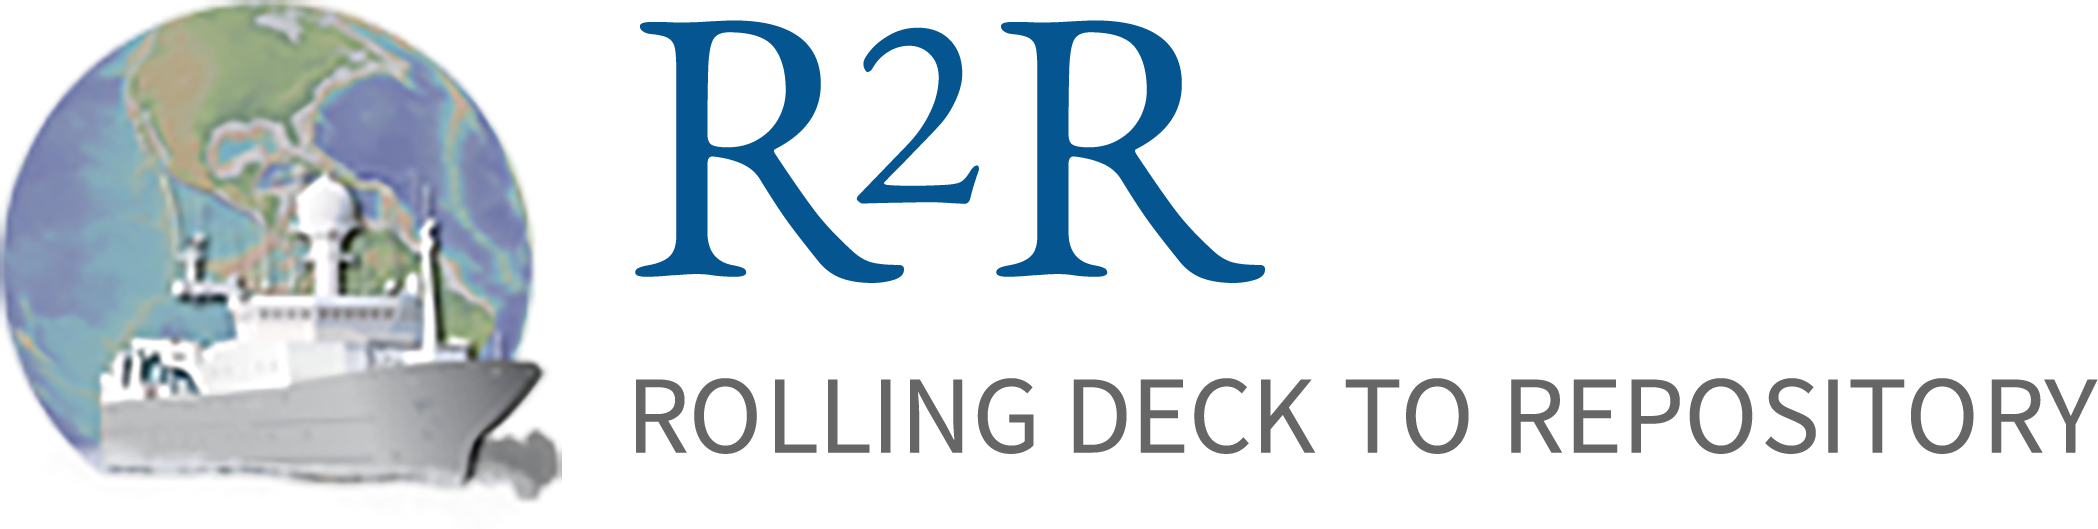 Thumbnail of r2r